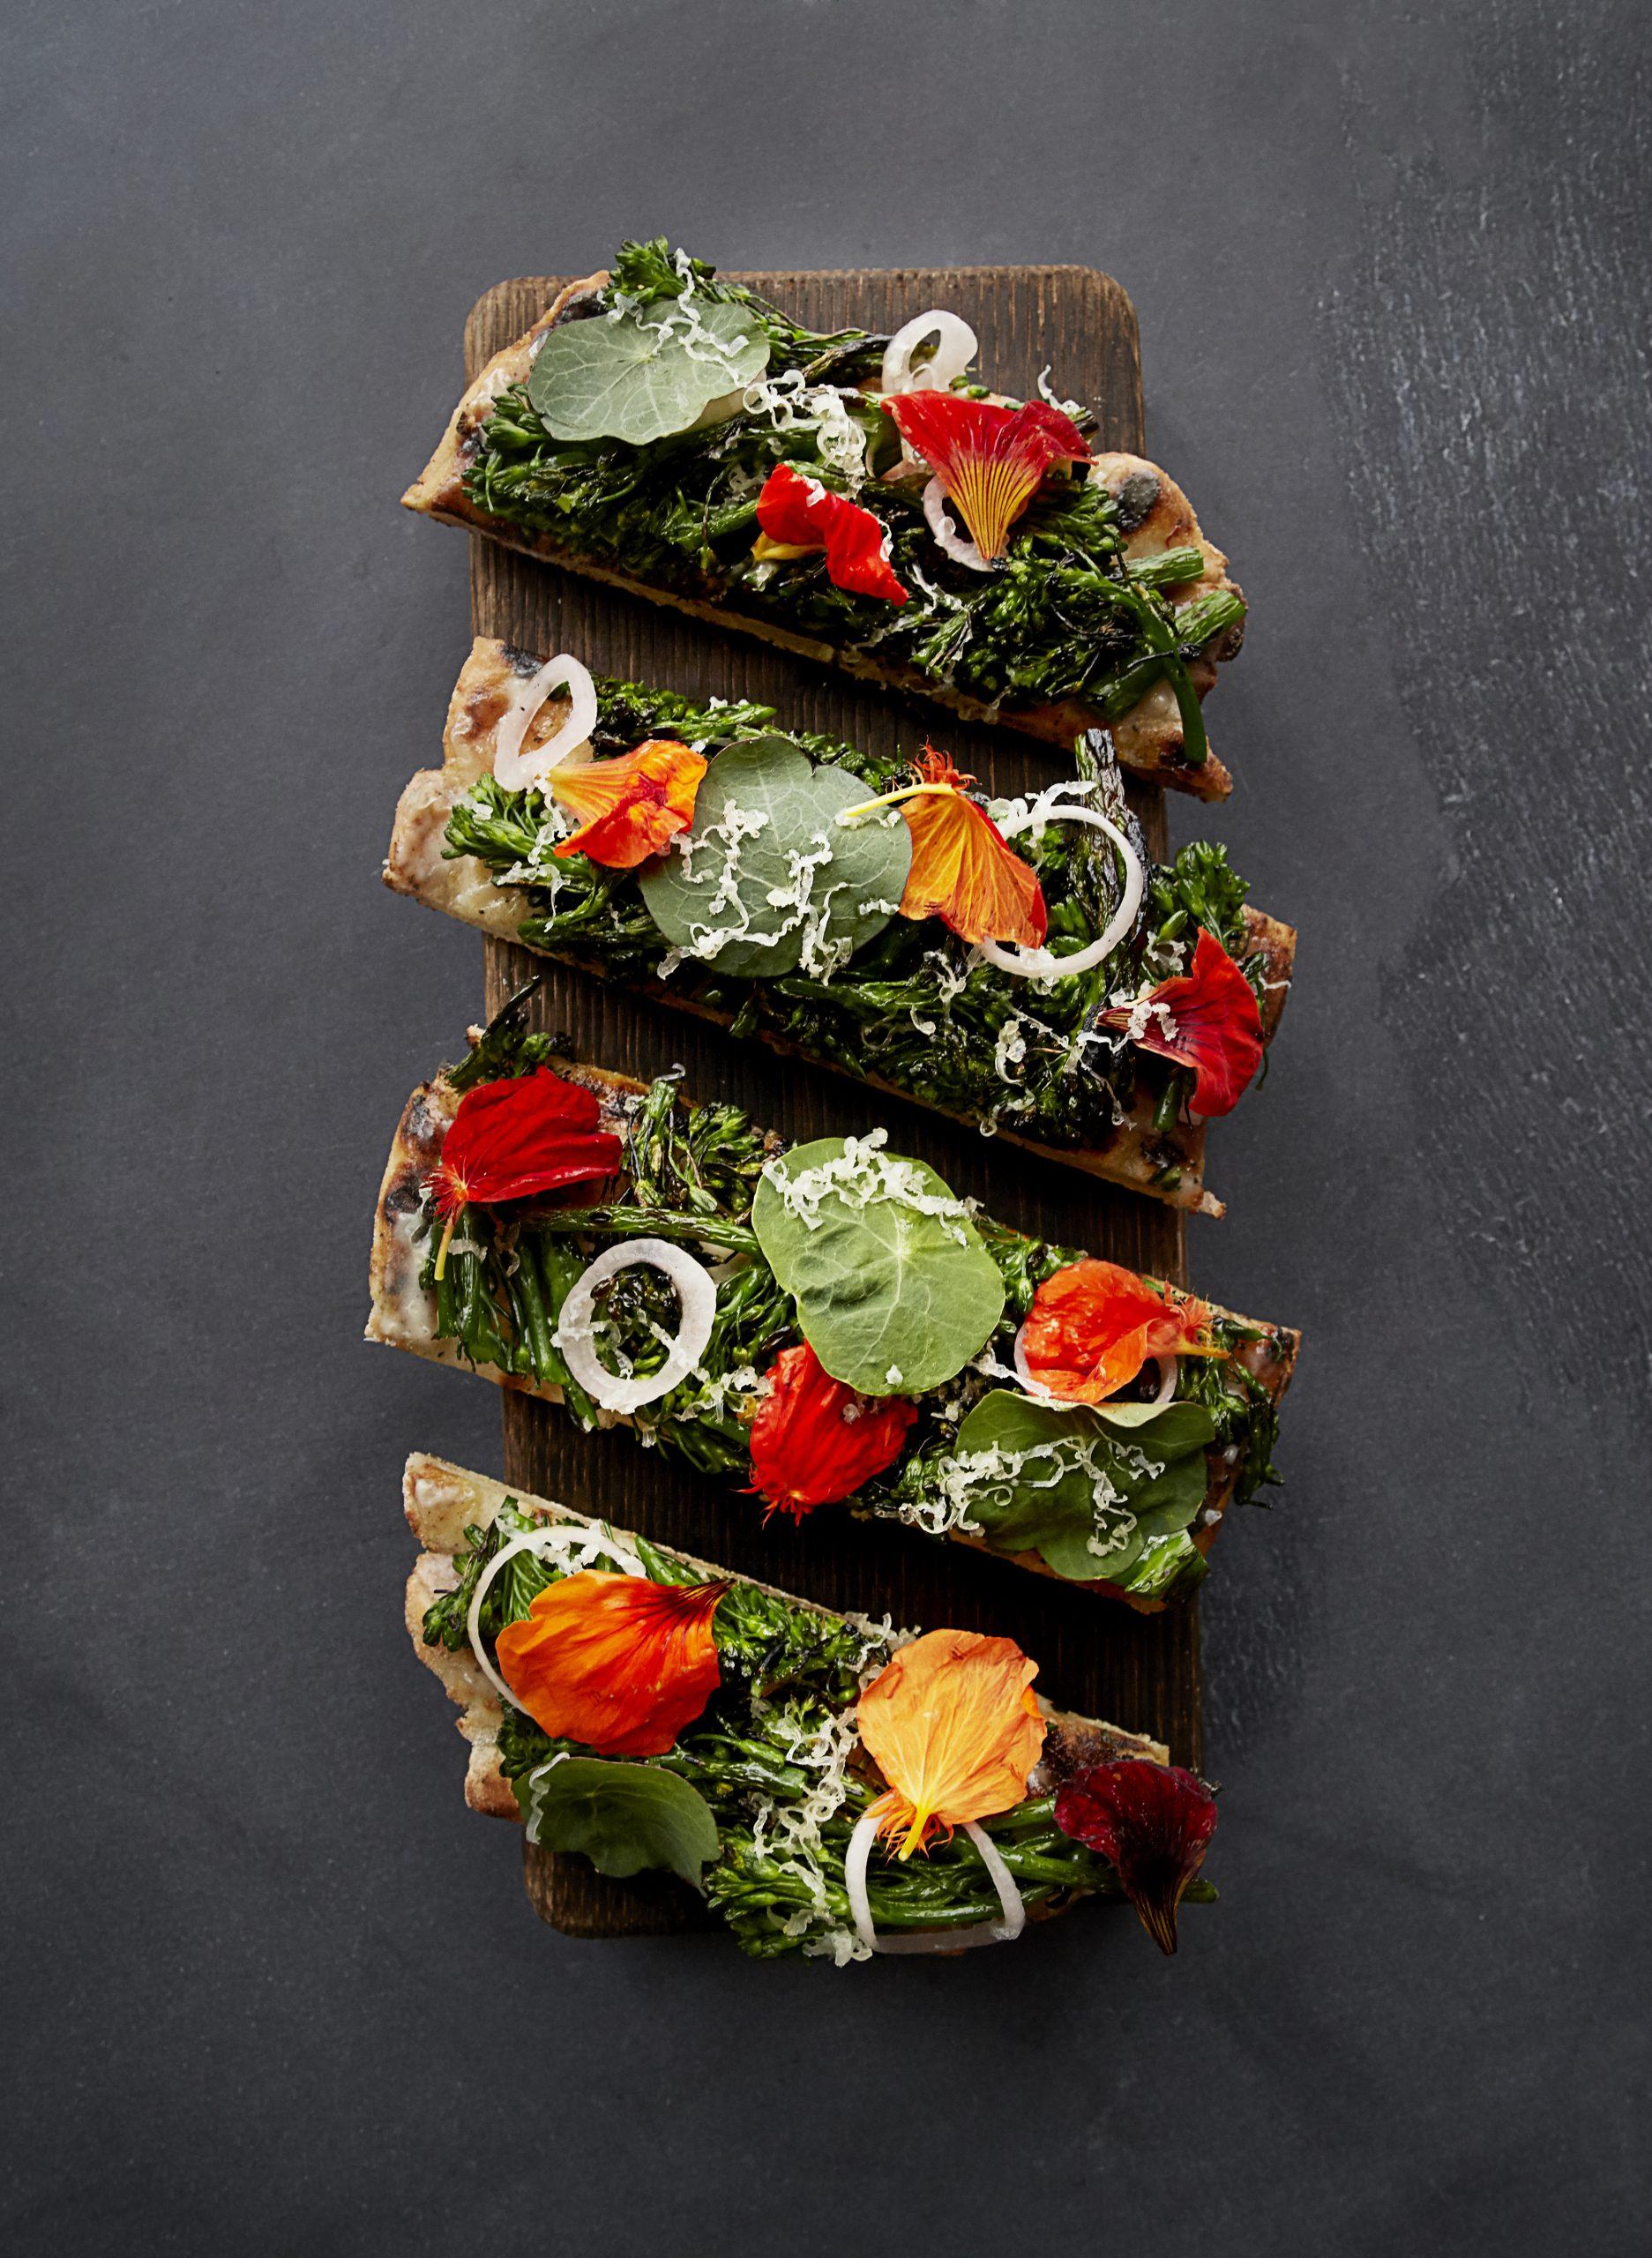 <broccoli rabe flatbread on wooden board